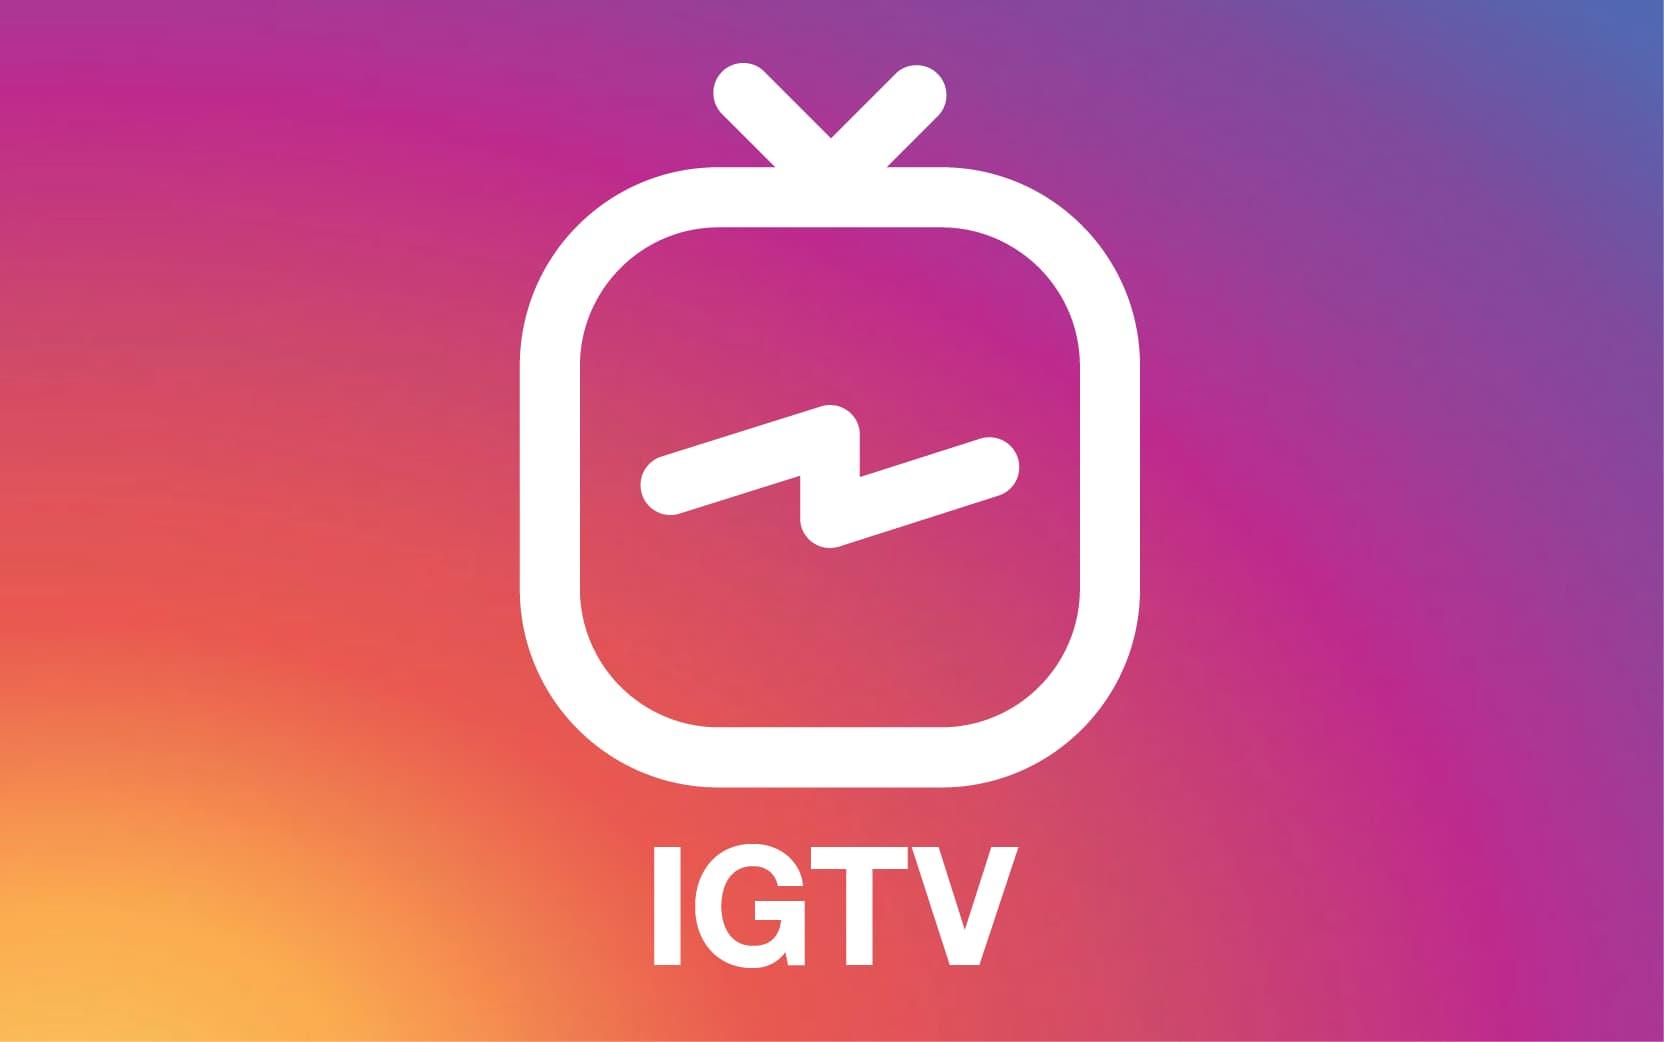 IGTV اینستاگرام حذف می شود!